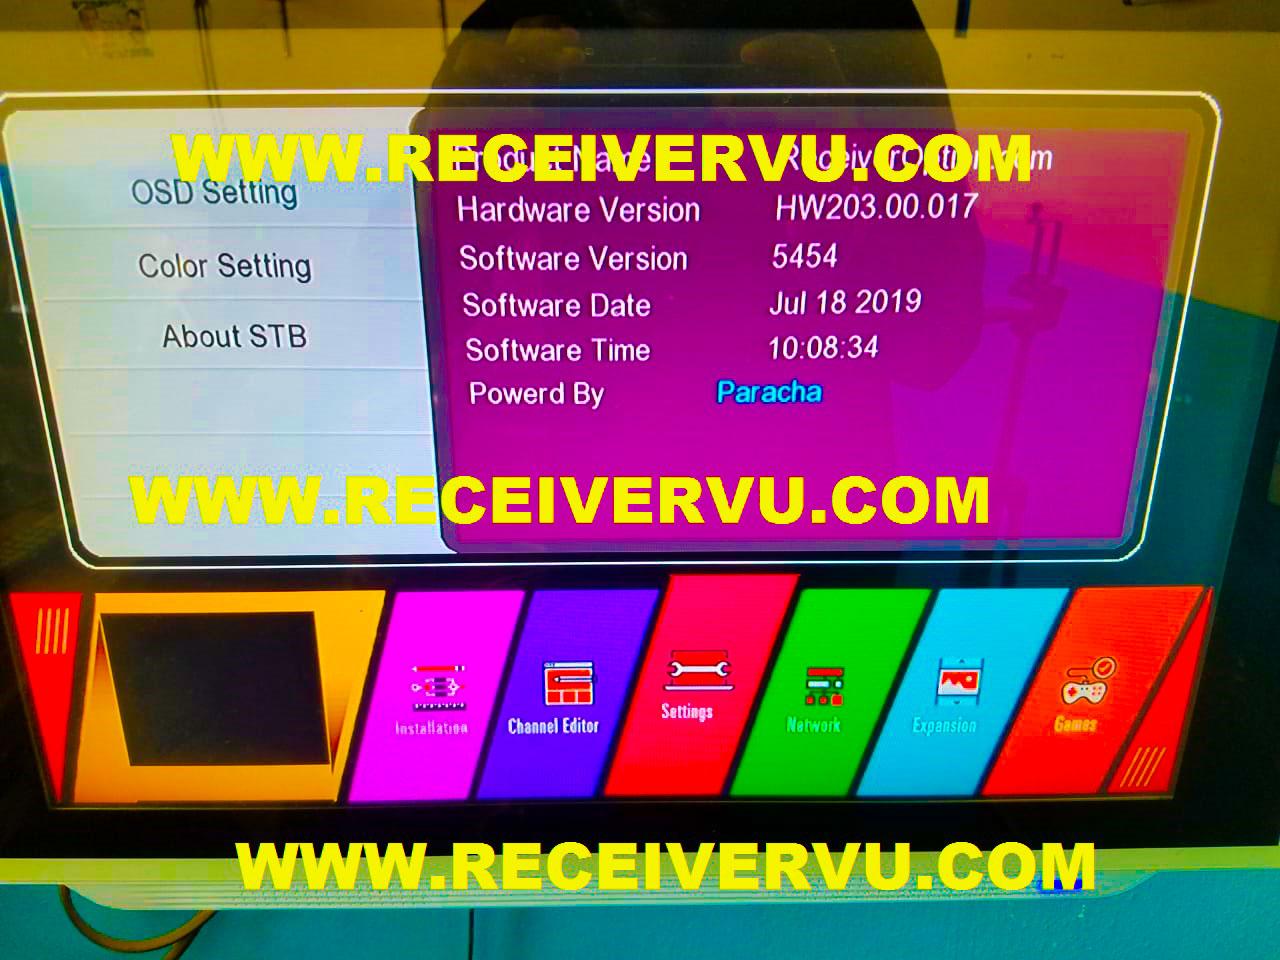 GX6605S HW203 00 017 TEN SPORTS OK & CCCAM ACTIVE NEW MENU SOFTWARE